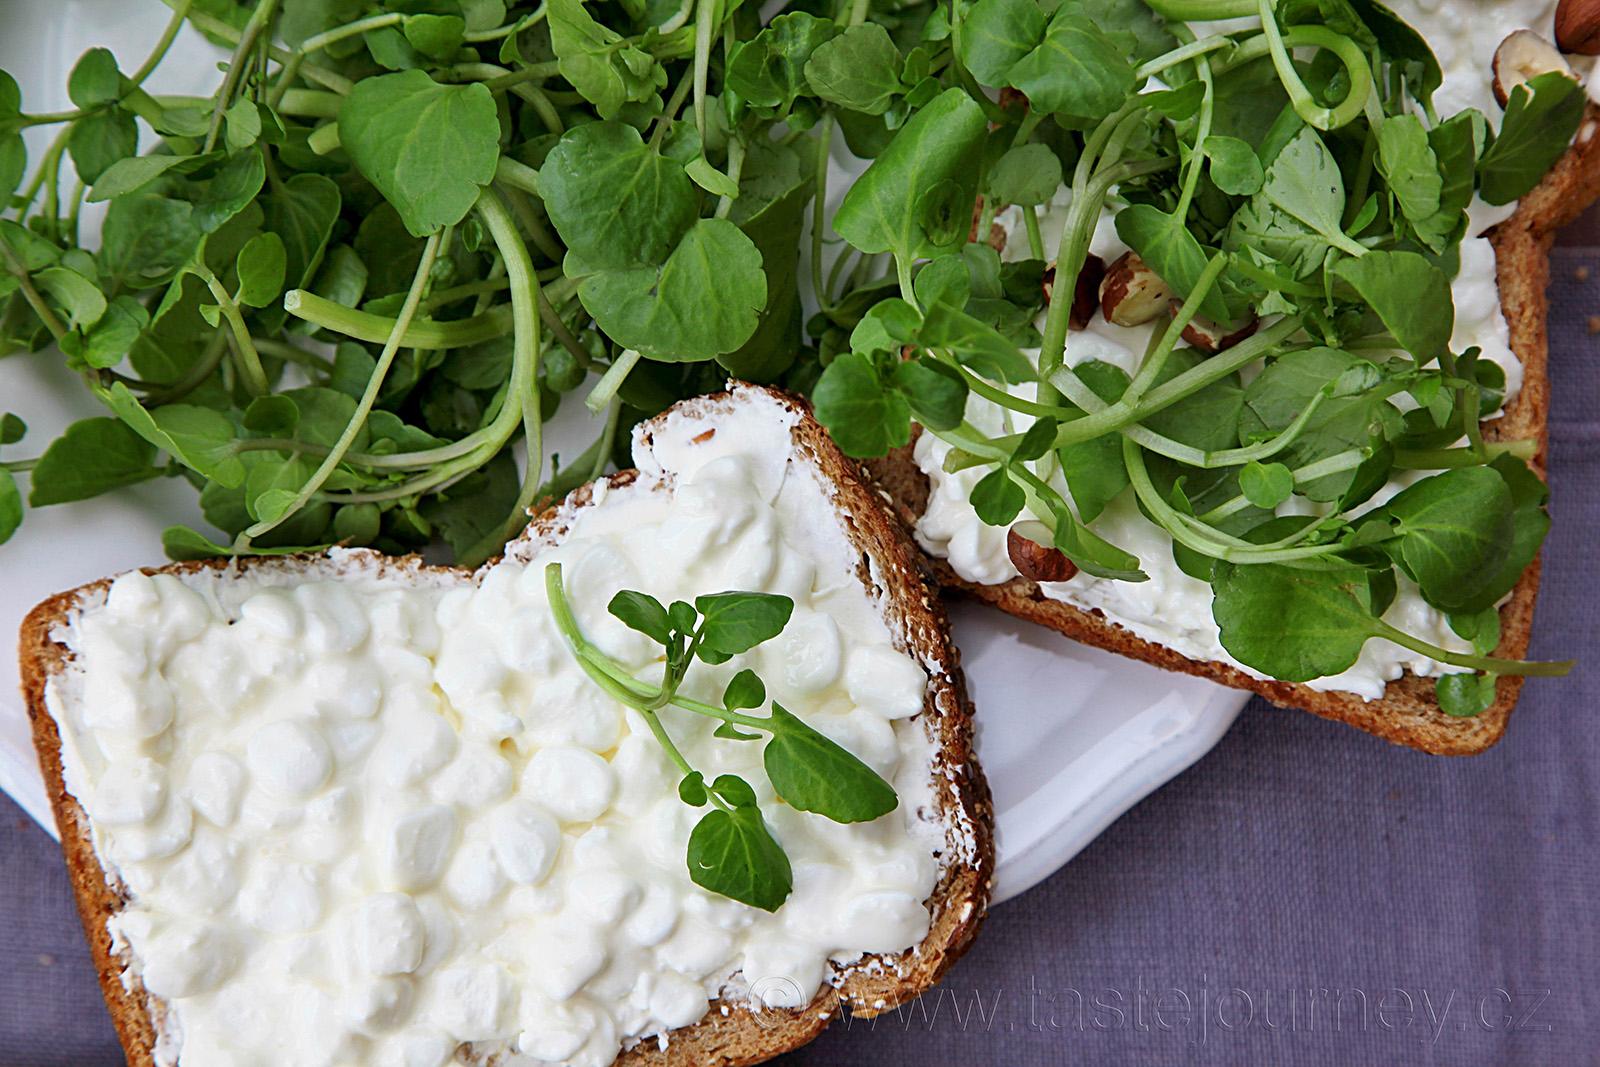 Na tmavý chléb dejte cottage cheese a doplňte potočnicí